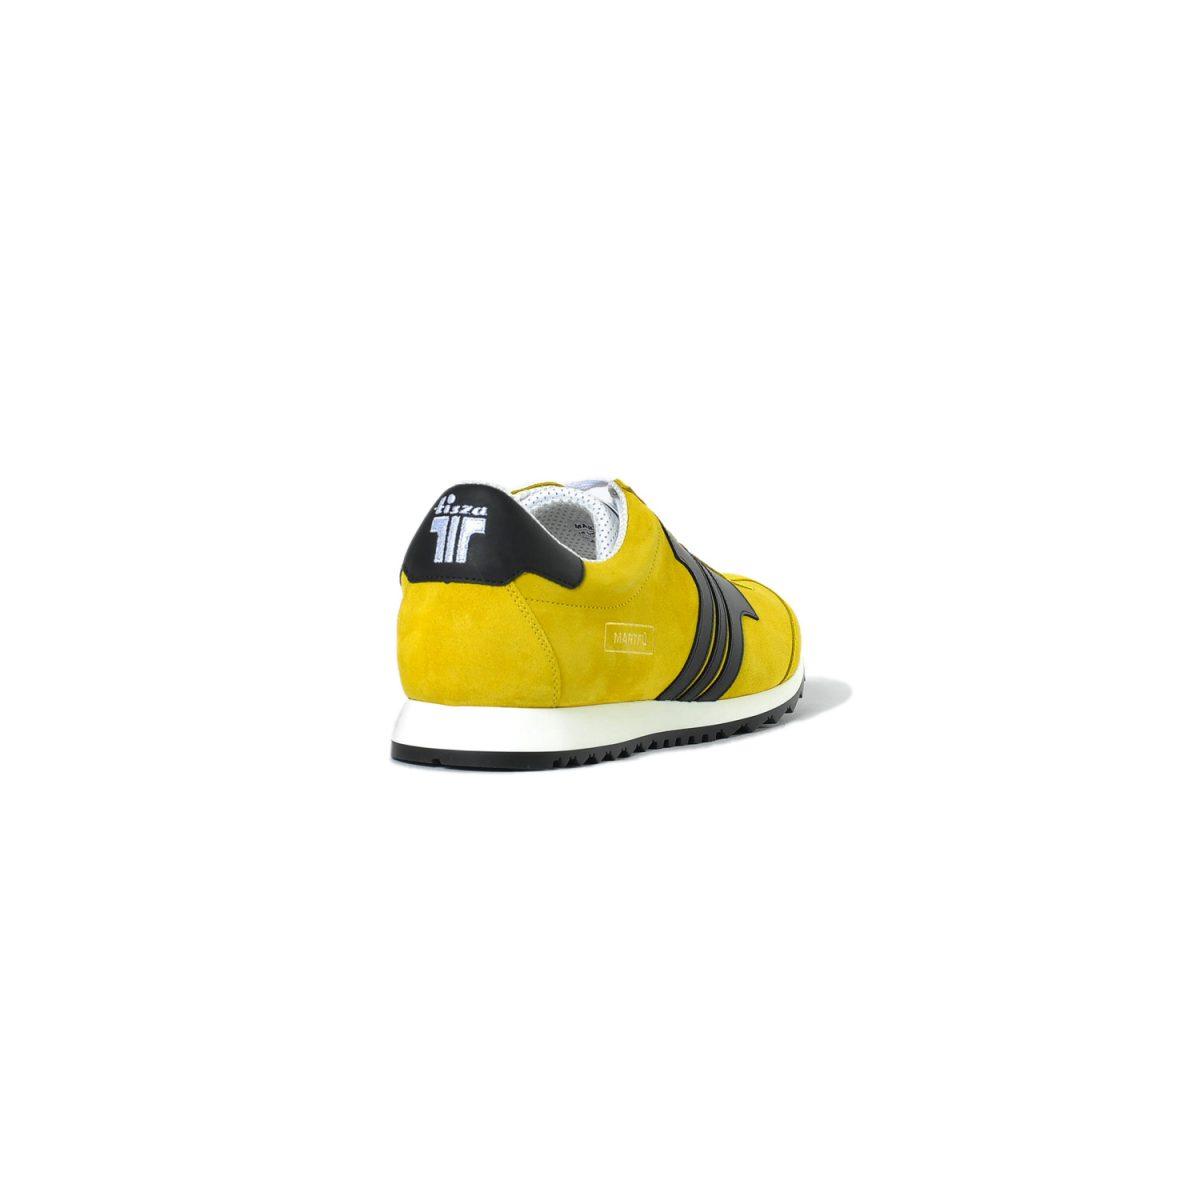 Tisza cipő - Martfű - Mustár-fekete